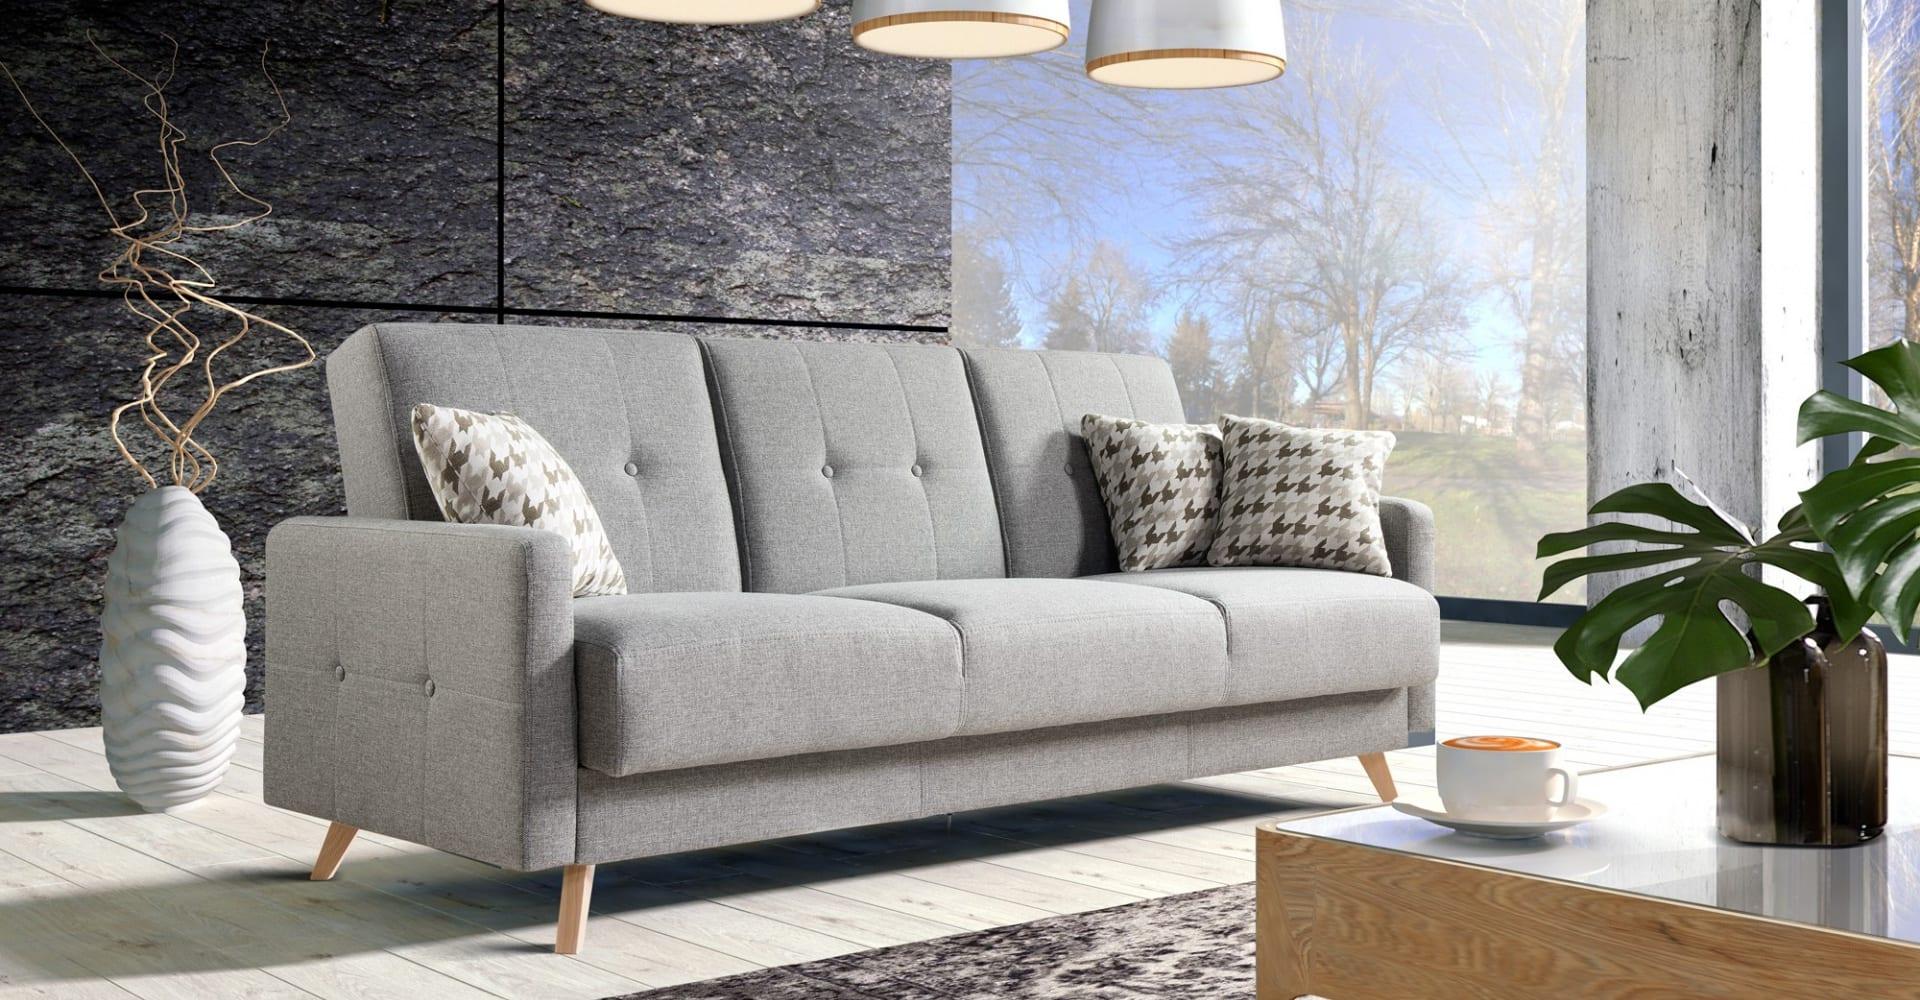 Salon meblowy Mebest Poznan, meble Caya Design sofa Scandi